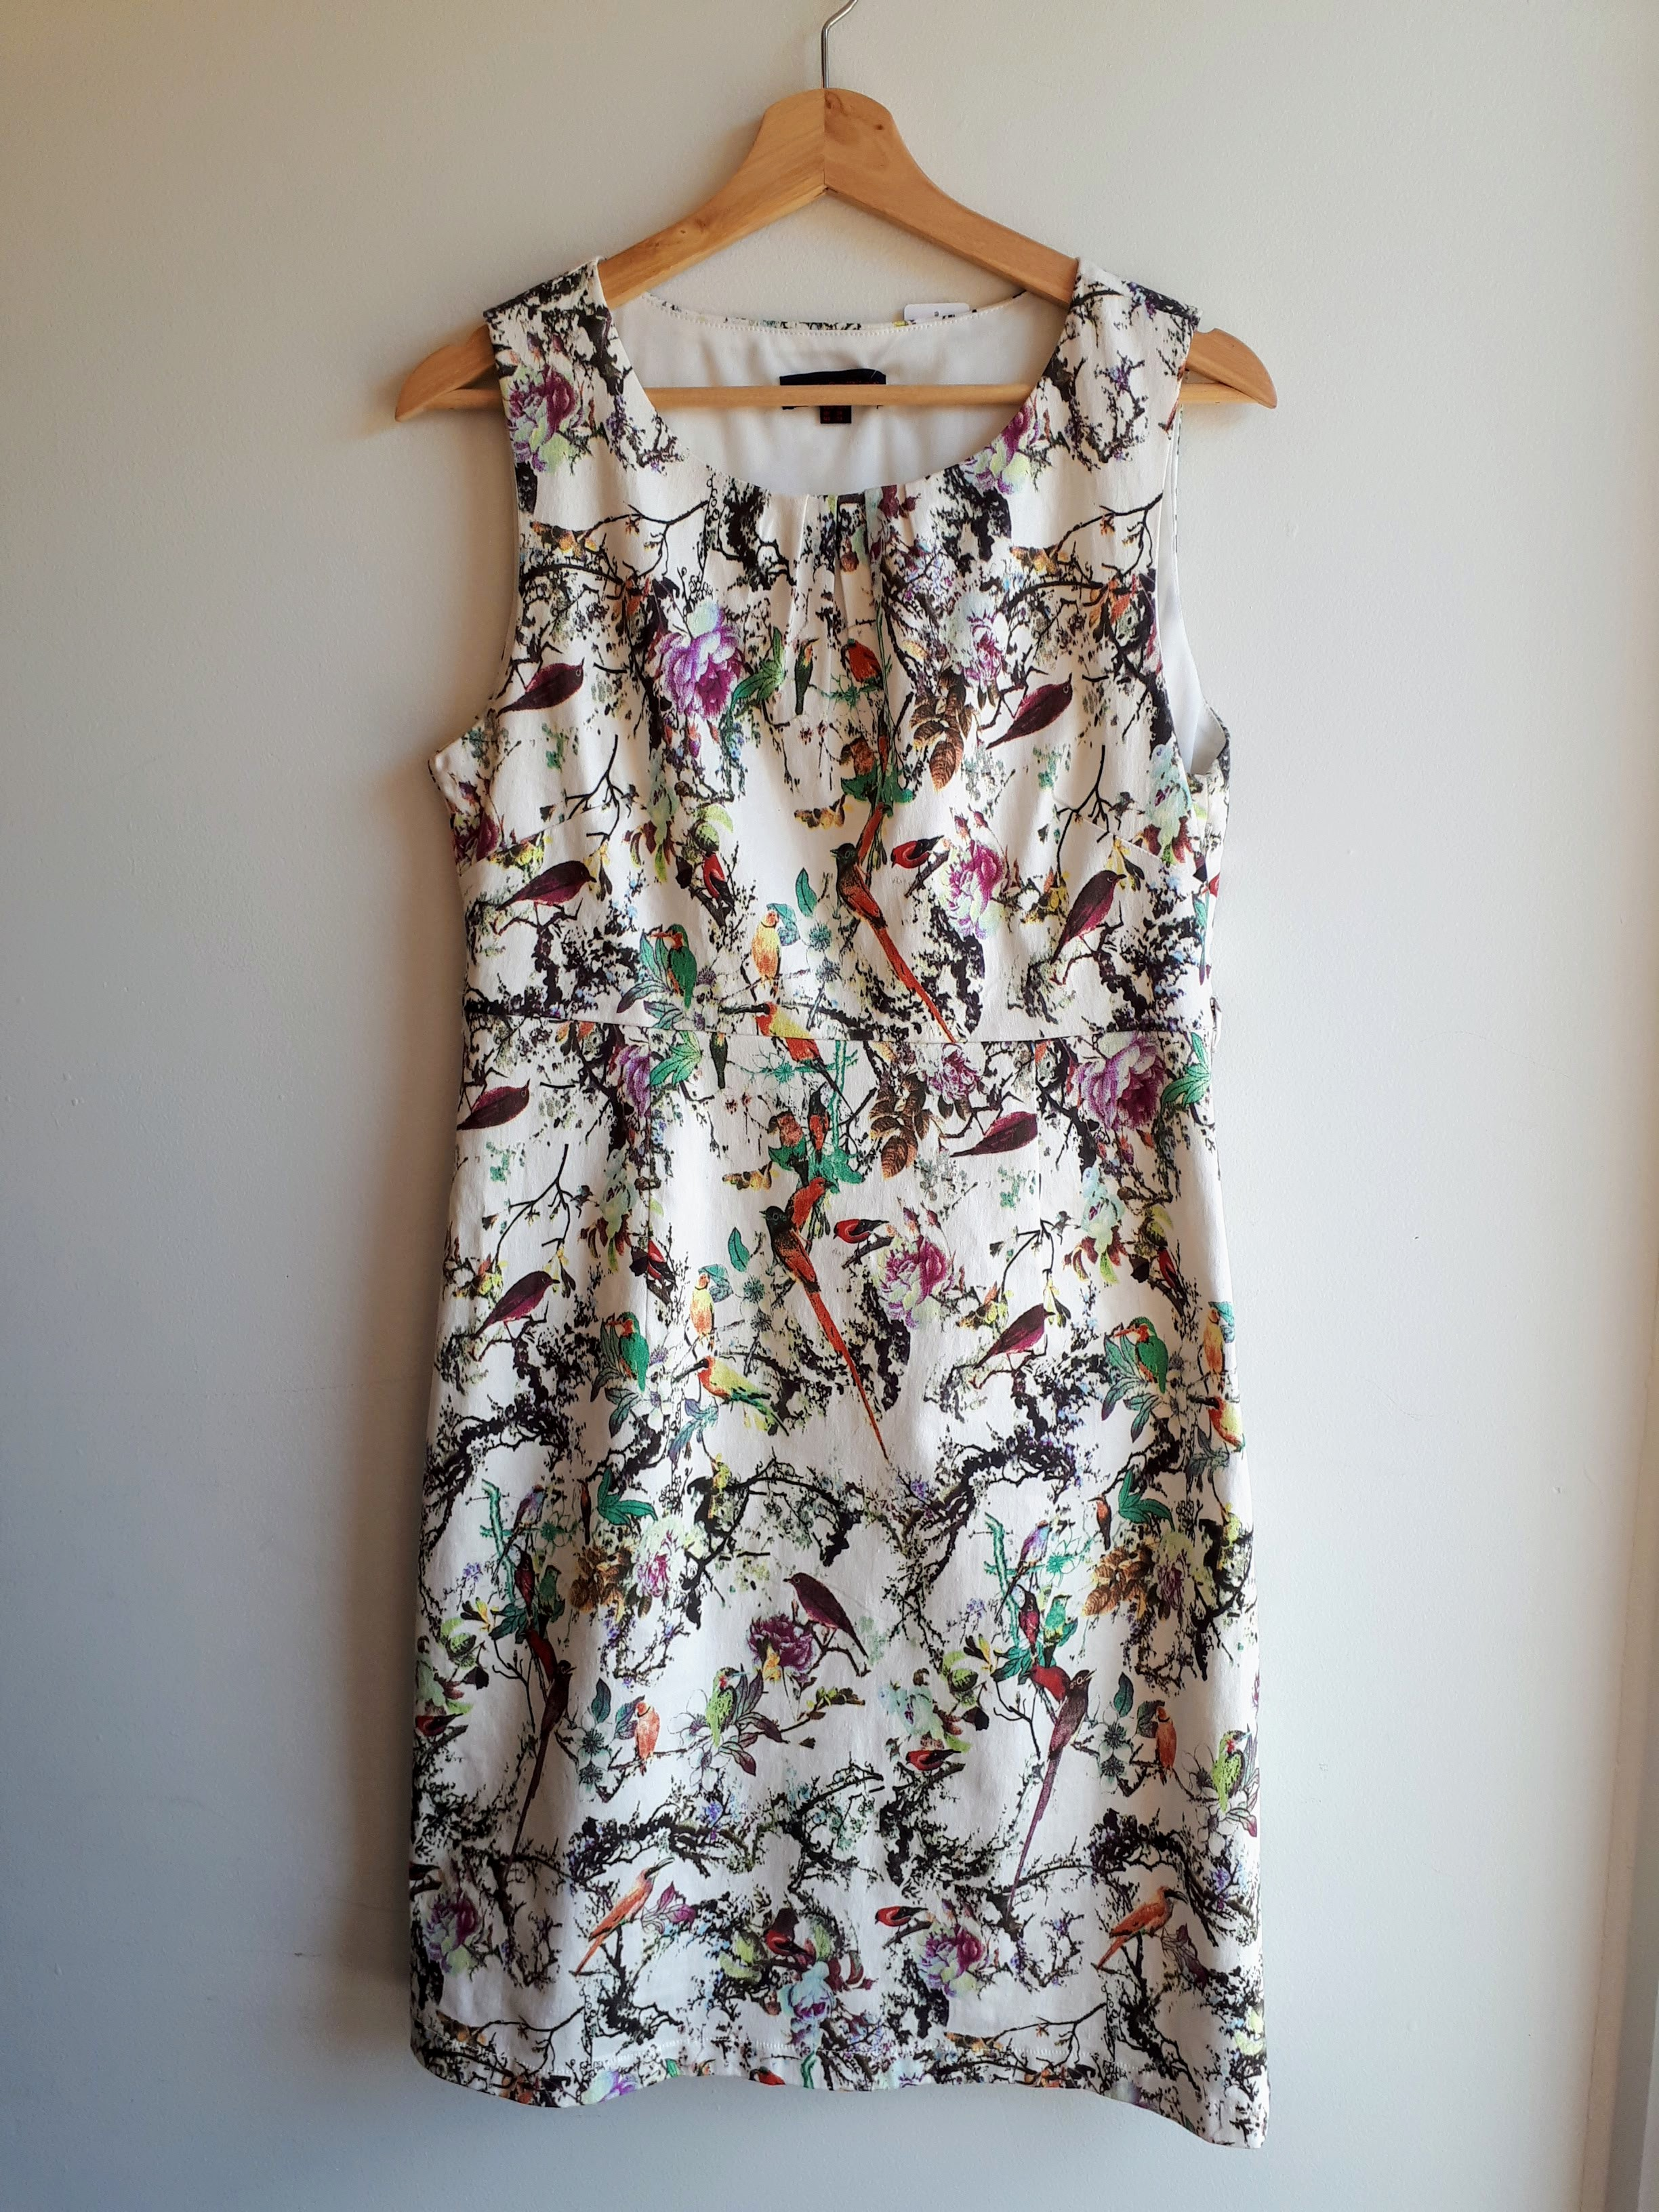 Super-Stition dress; Size 14, $36